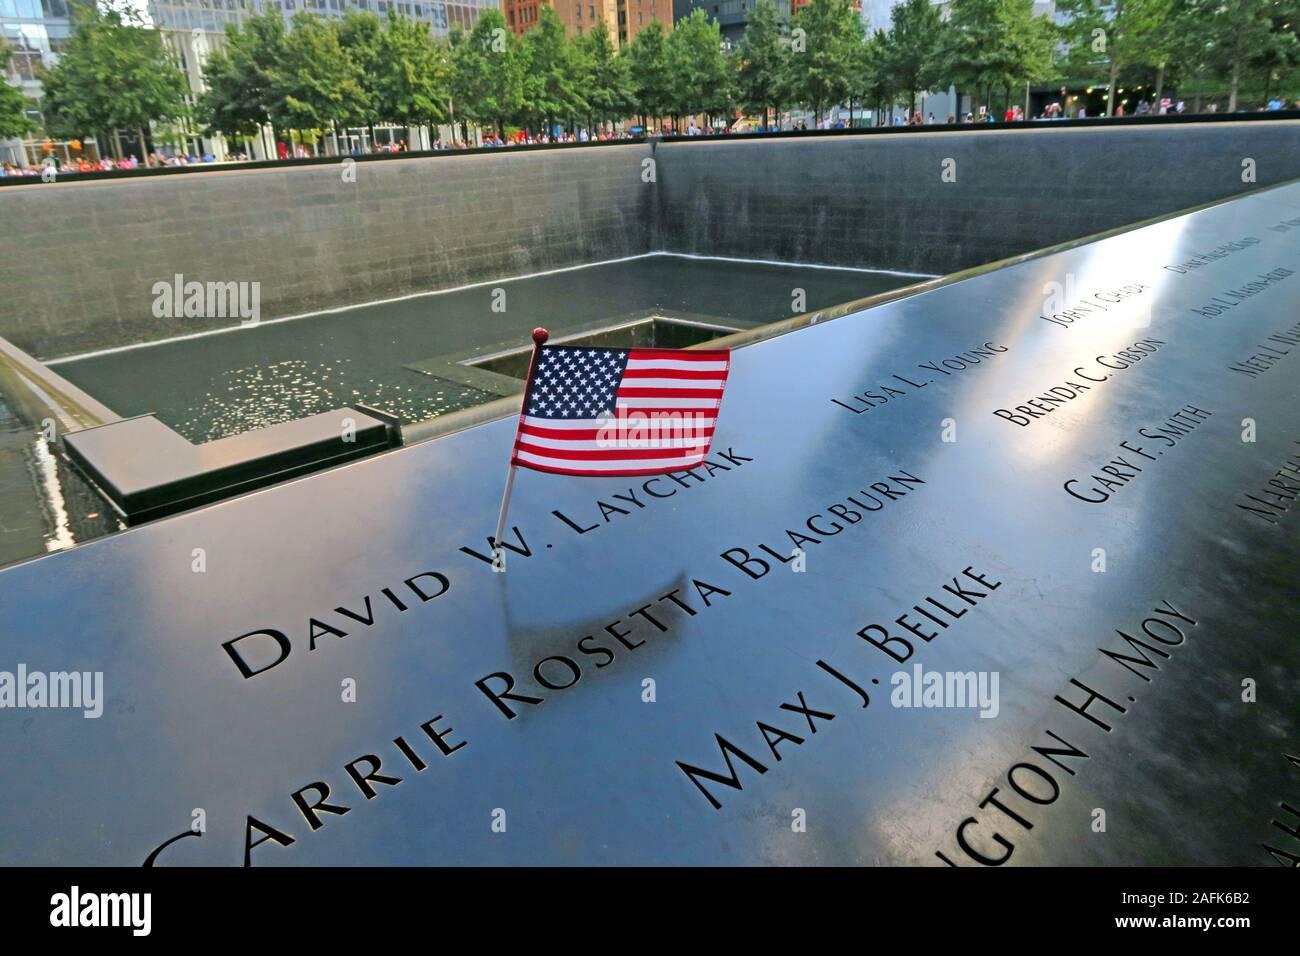 HotpixUK,@HotpixUk,GoTonySmith,NYC,NY,New York,Manhattan,USA,city,city centre,US,with small flag,David W Laychak,Carrie Rosetta Blagburn,Max J Beilke,Gary F Smith,pool,9/11